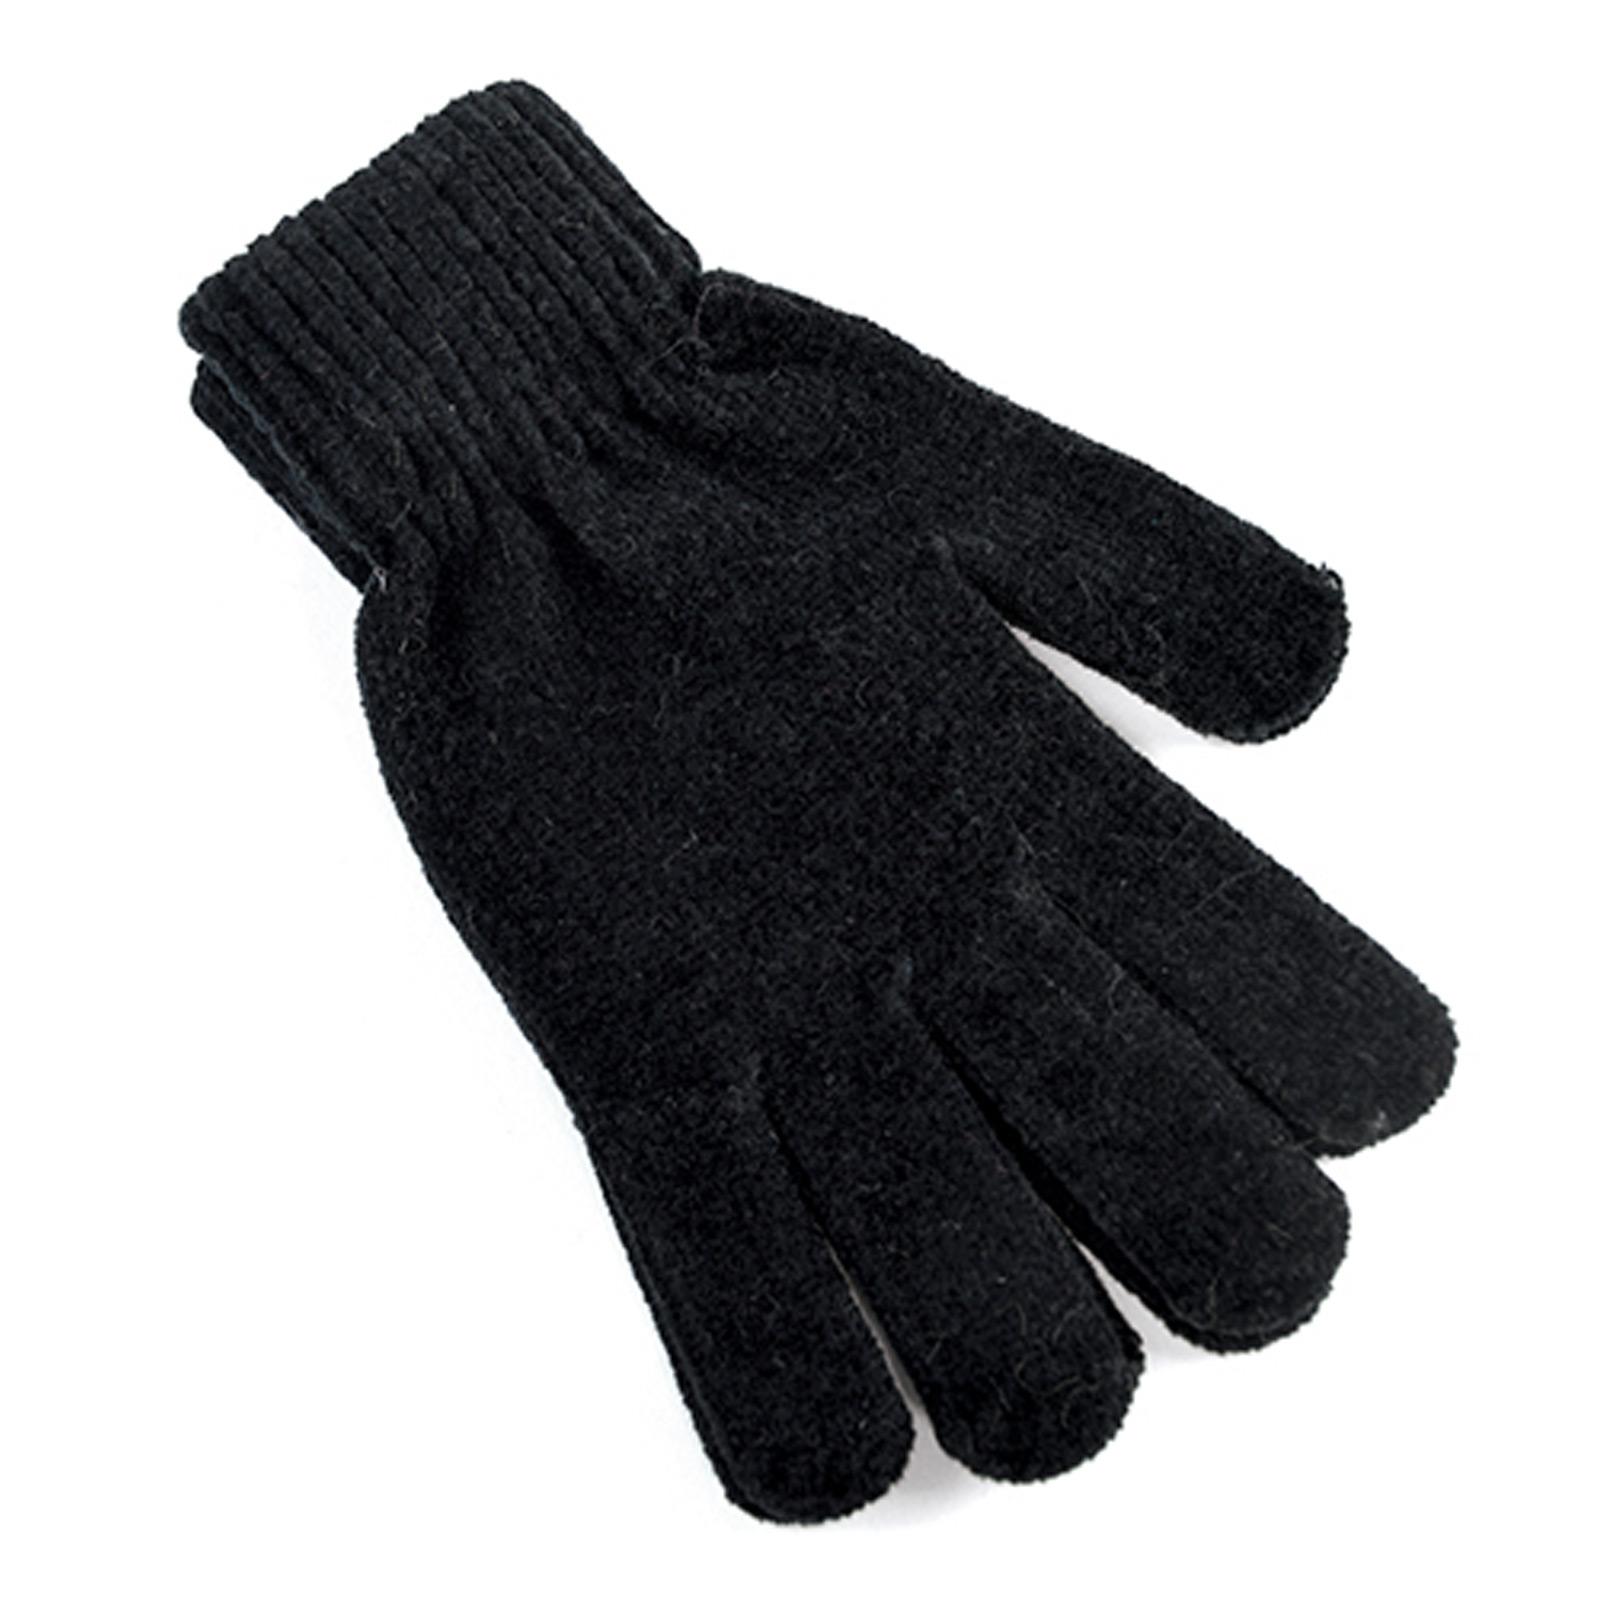 Black gloves white magic - Las Magic Chenille Gloves Warm Winter Accessory Grey Berry Teal